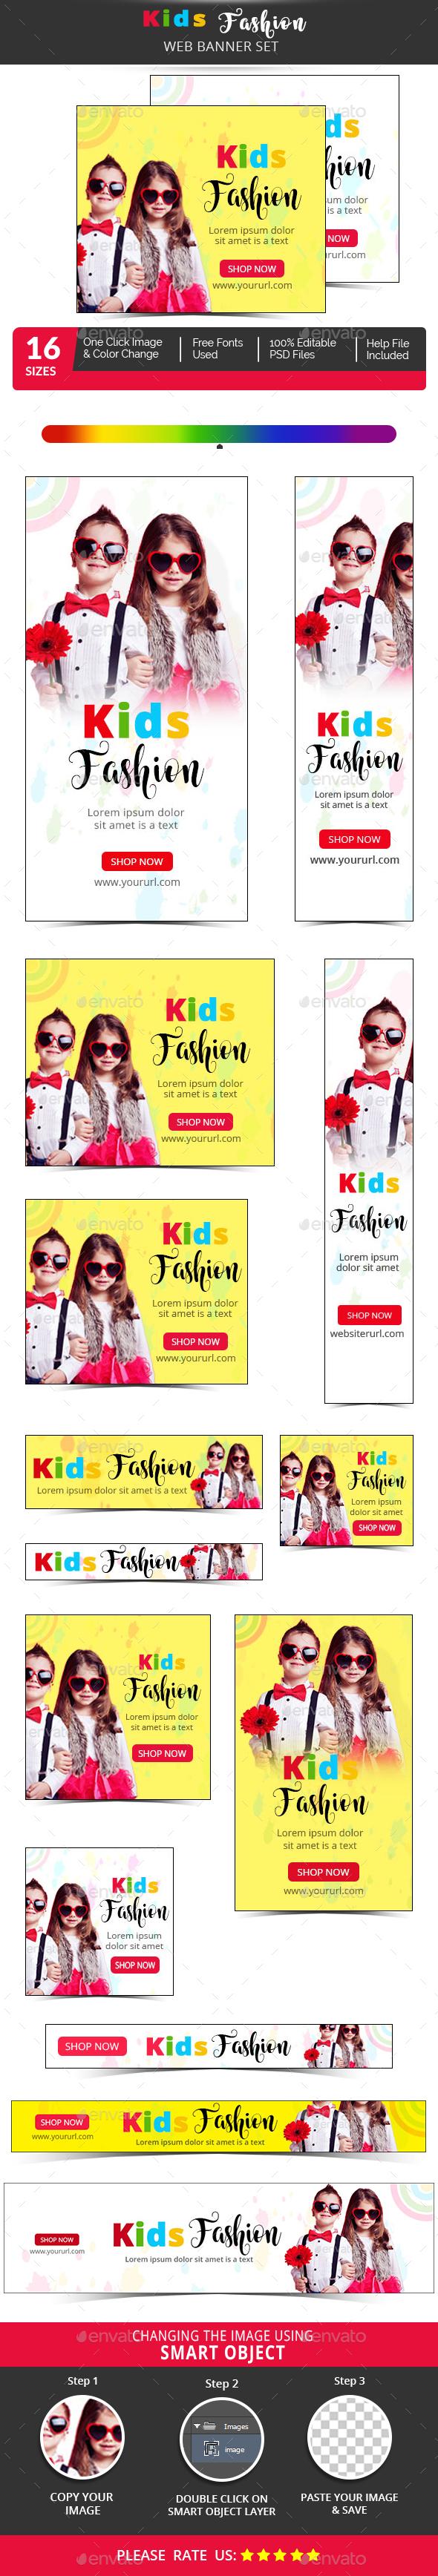 Kids Fashion Banner Set - Banners & Ads Web Elements